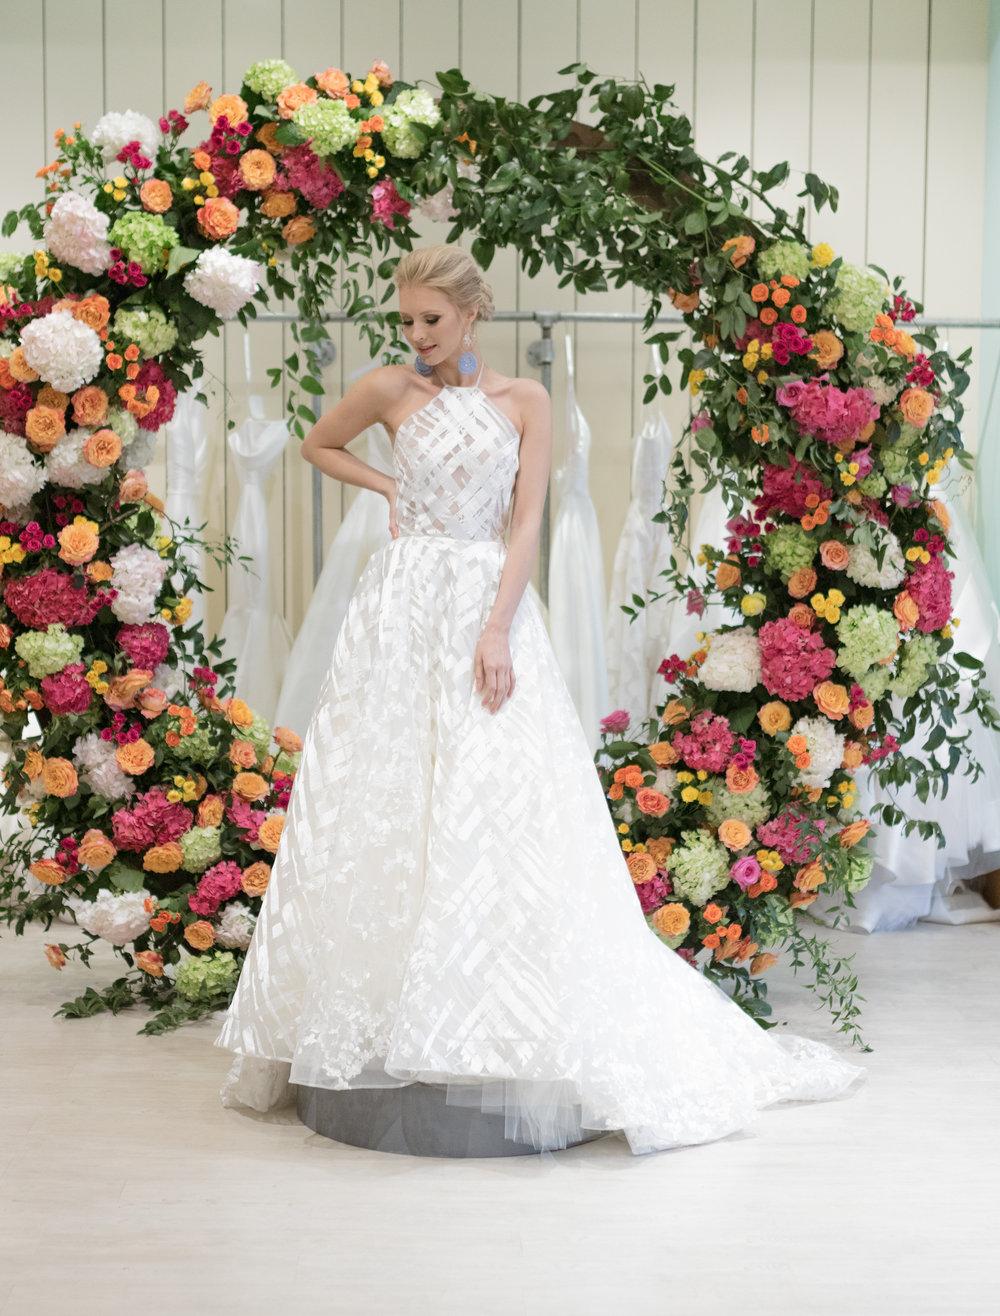 Meet Christi- Penelope + Lex Florals by: Lee Forrest Design